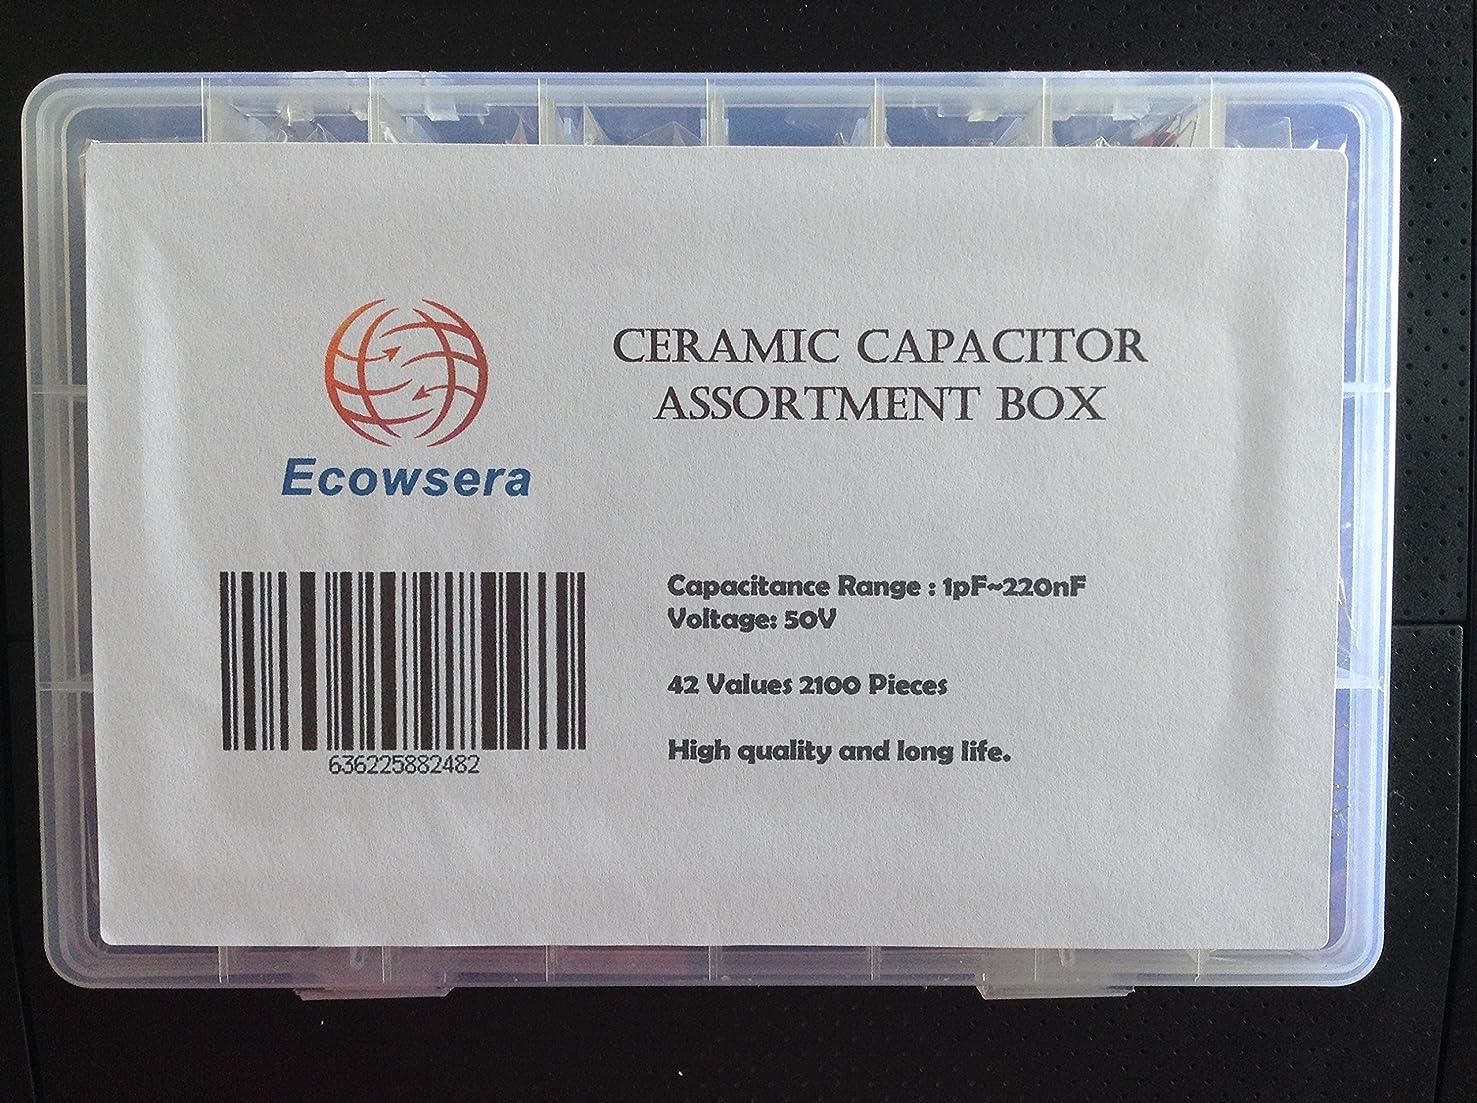 42 Value 2100 pcs Ceramic Capacitor Assortment Box Kit